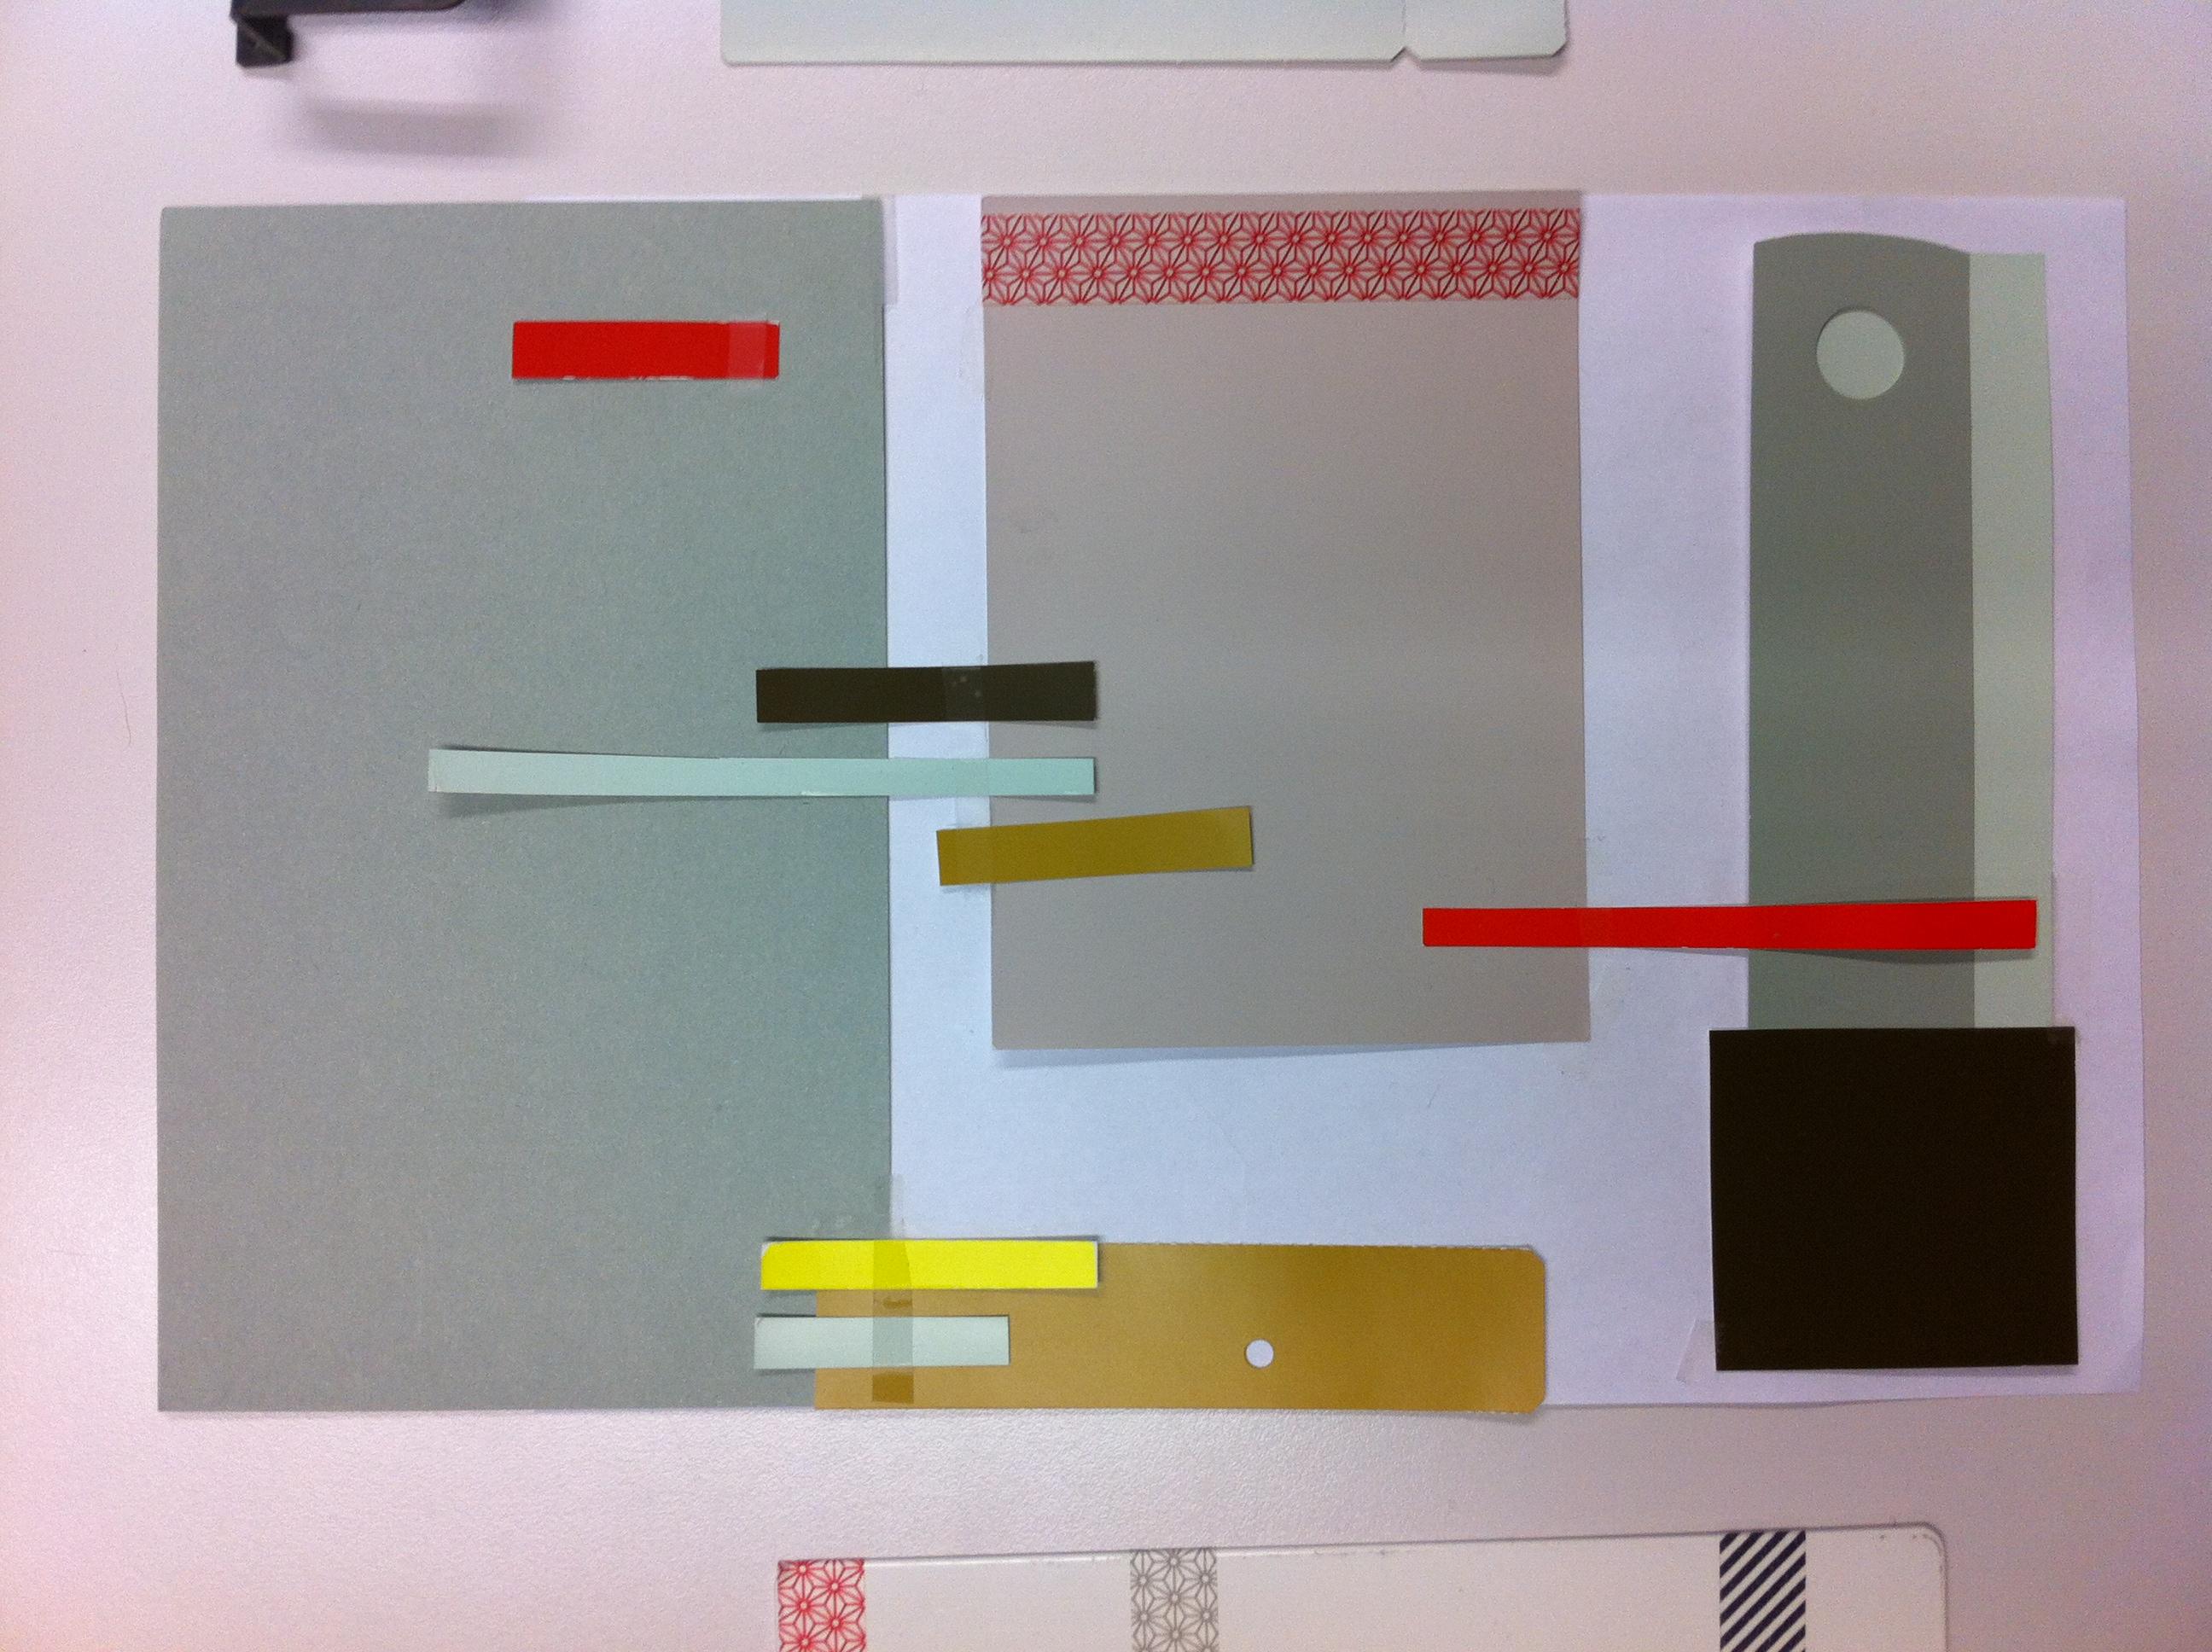 kleuren grafiek signing - Bibliotheek Ligne Sittard